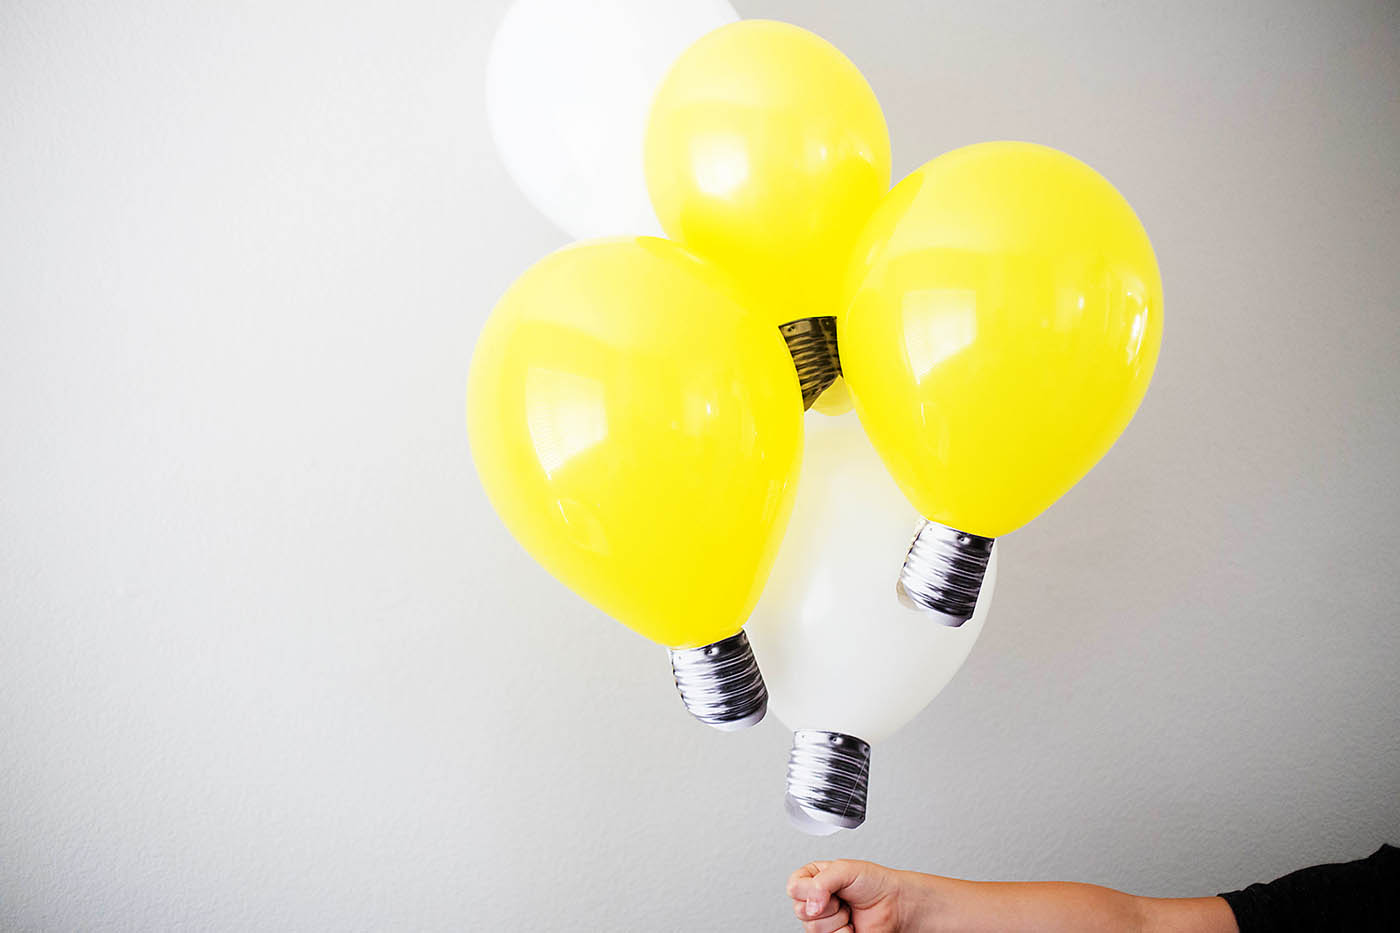 fishing chair backpack lawn umbrella holder diy lightbulb balloons — all for the boys